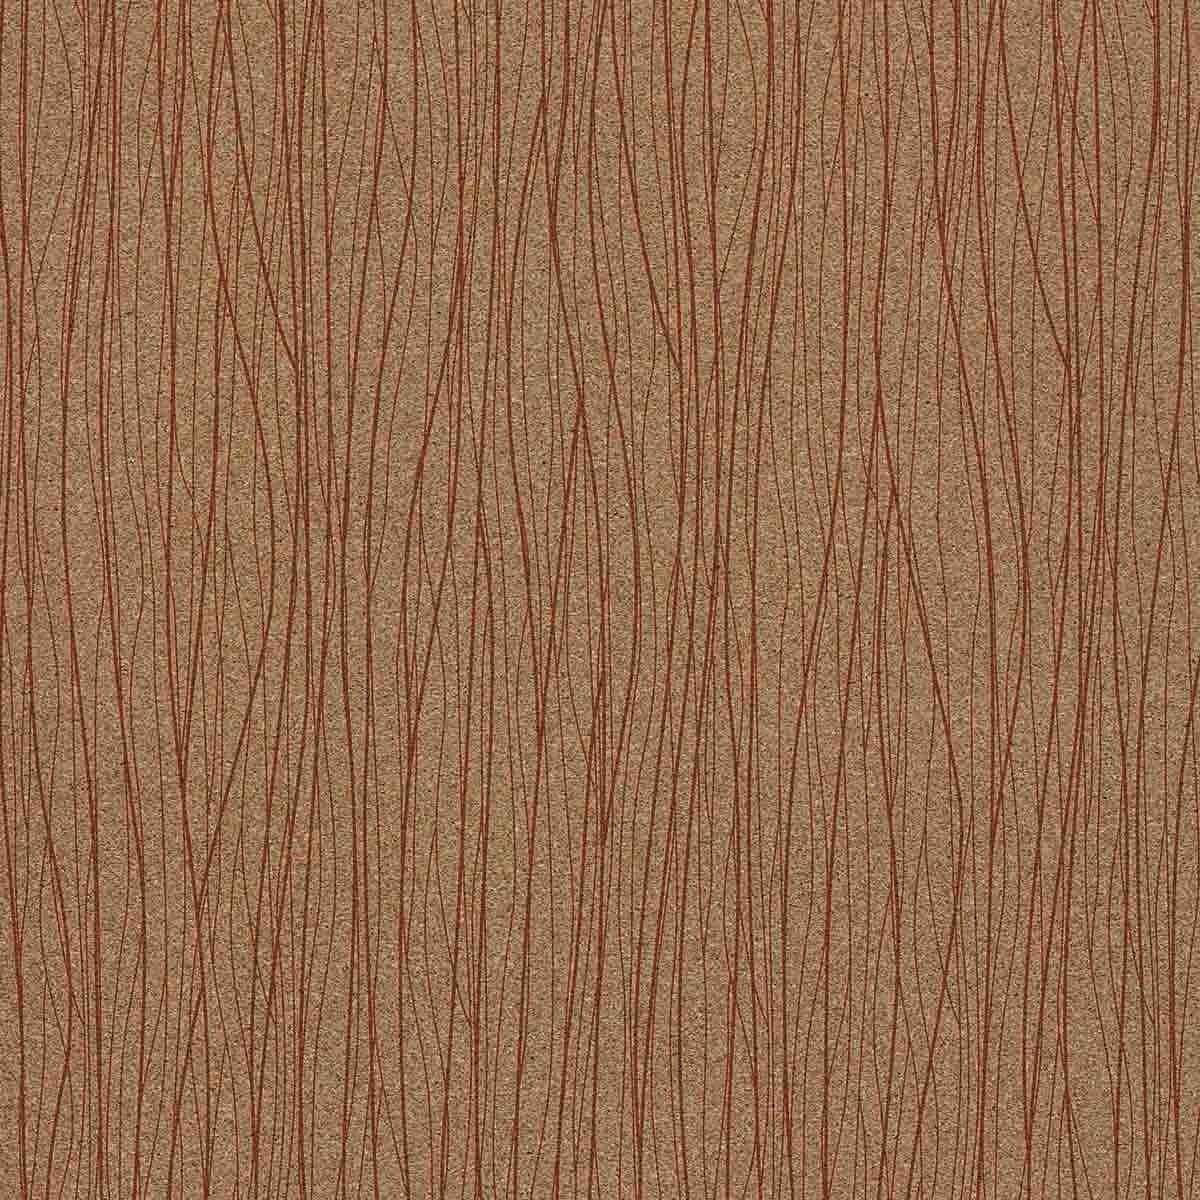 Decorative cork thin paper Connect Meca Orange Reverse Cork